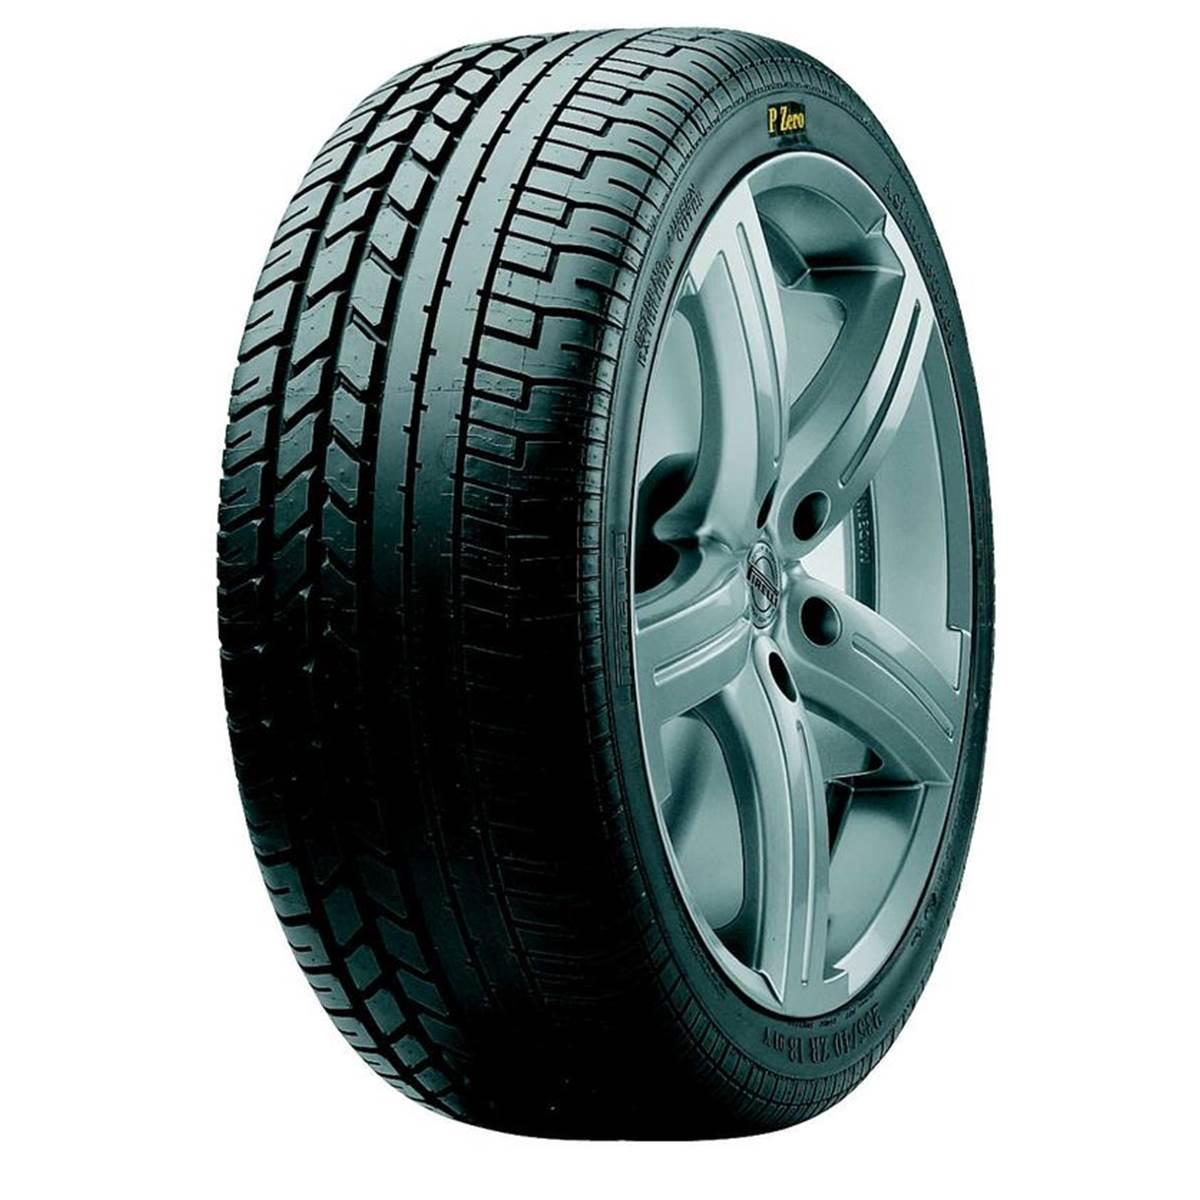 Pneu Pirelli 335/30R18 102Y Pzero Asimmetrico